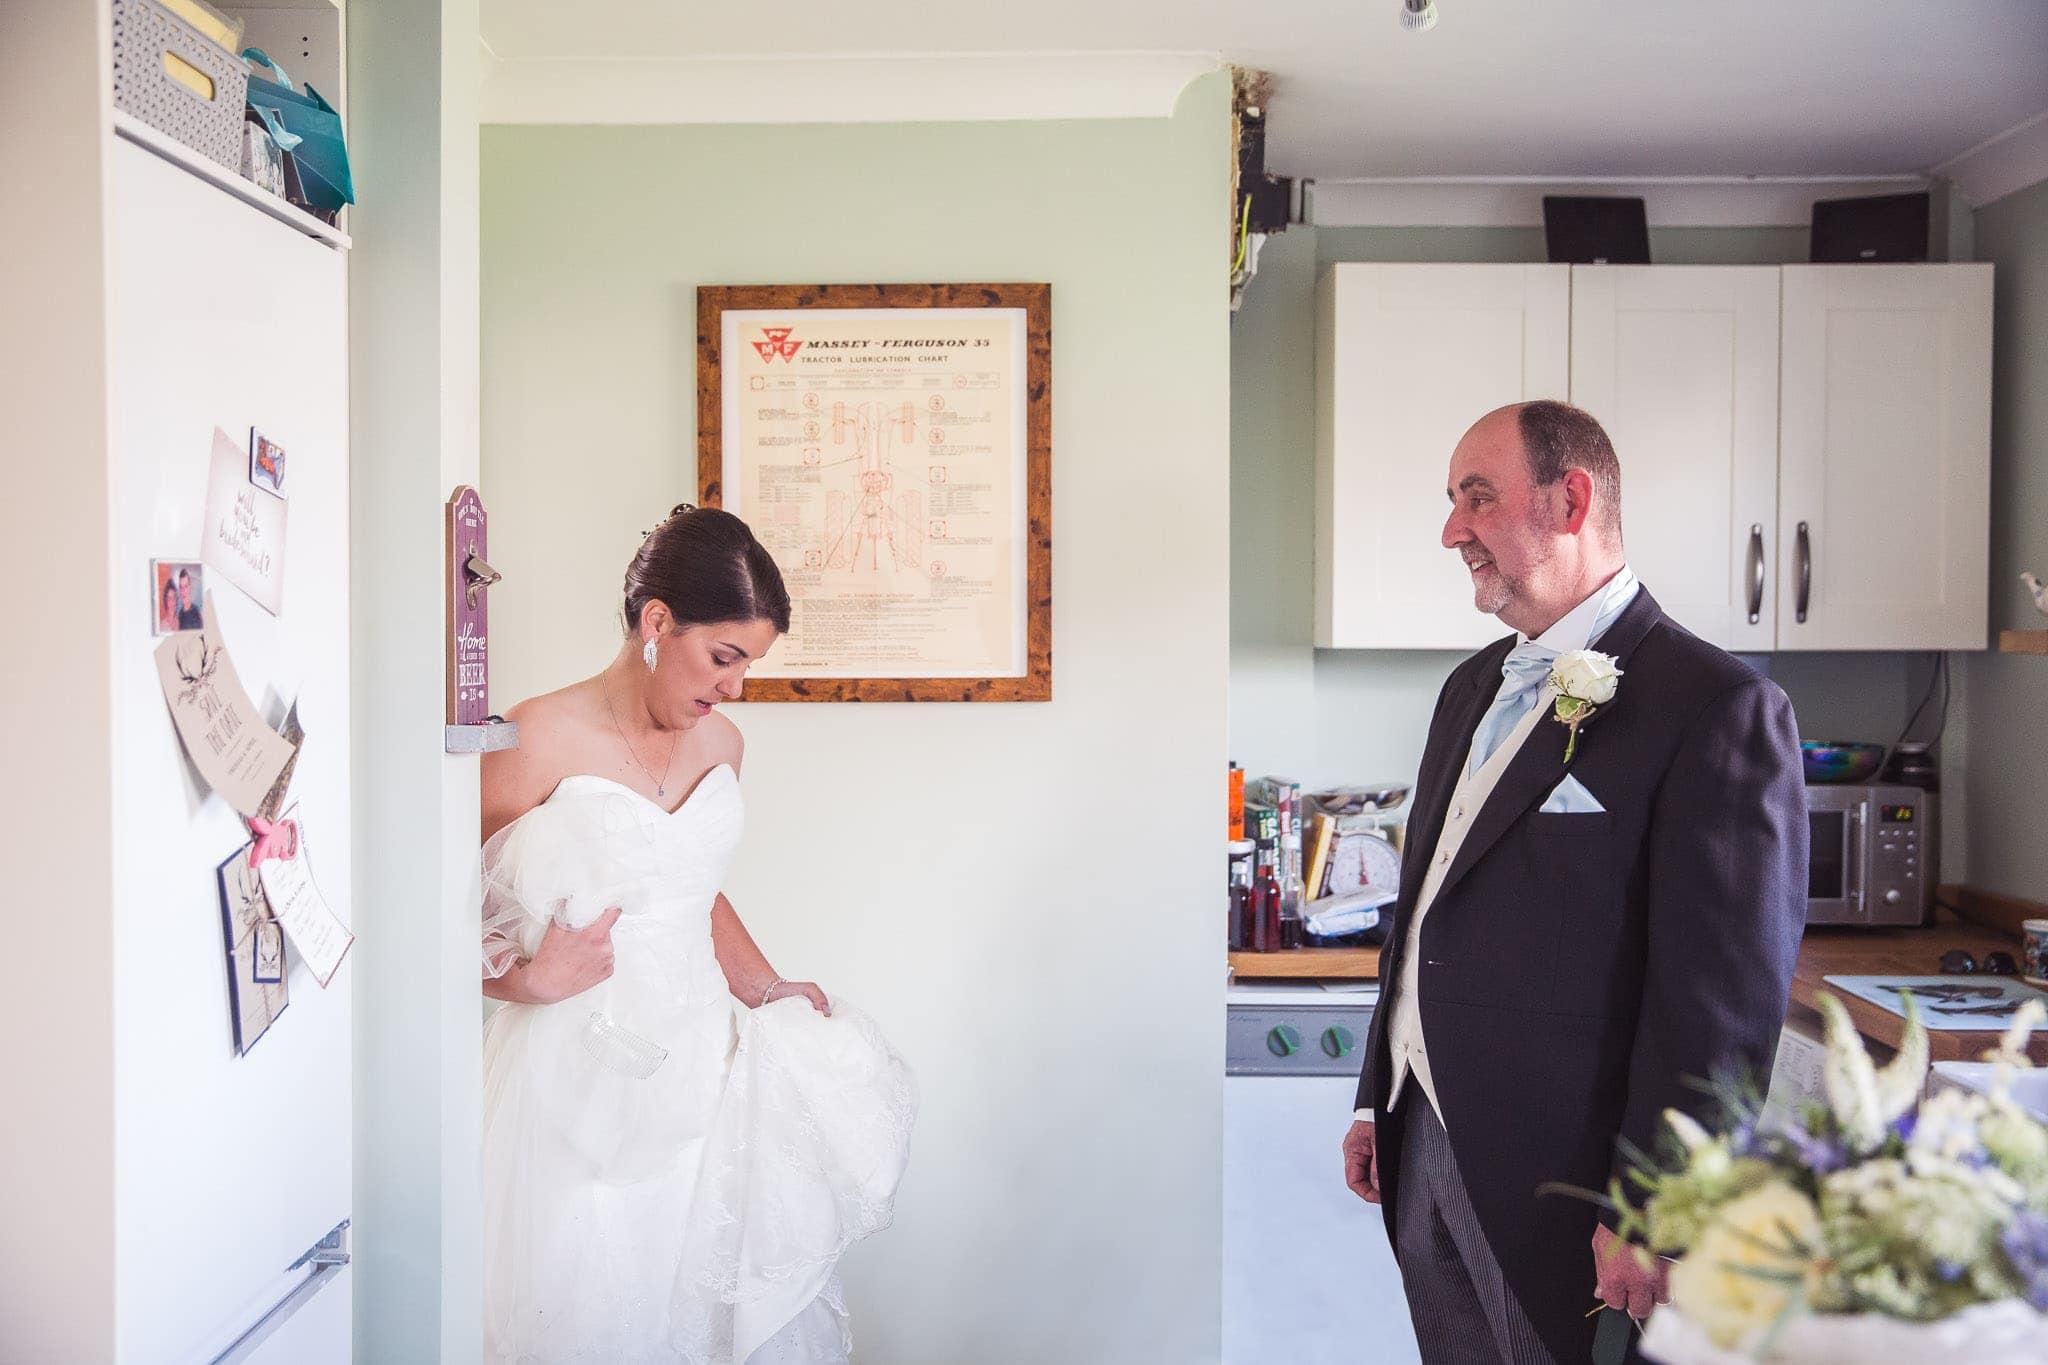 Catherine-George-Wedding-Cannington-Bridgwater-Somerset-Katie-Mortimore-Photography-small-45